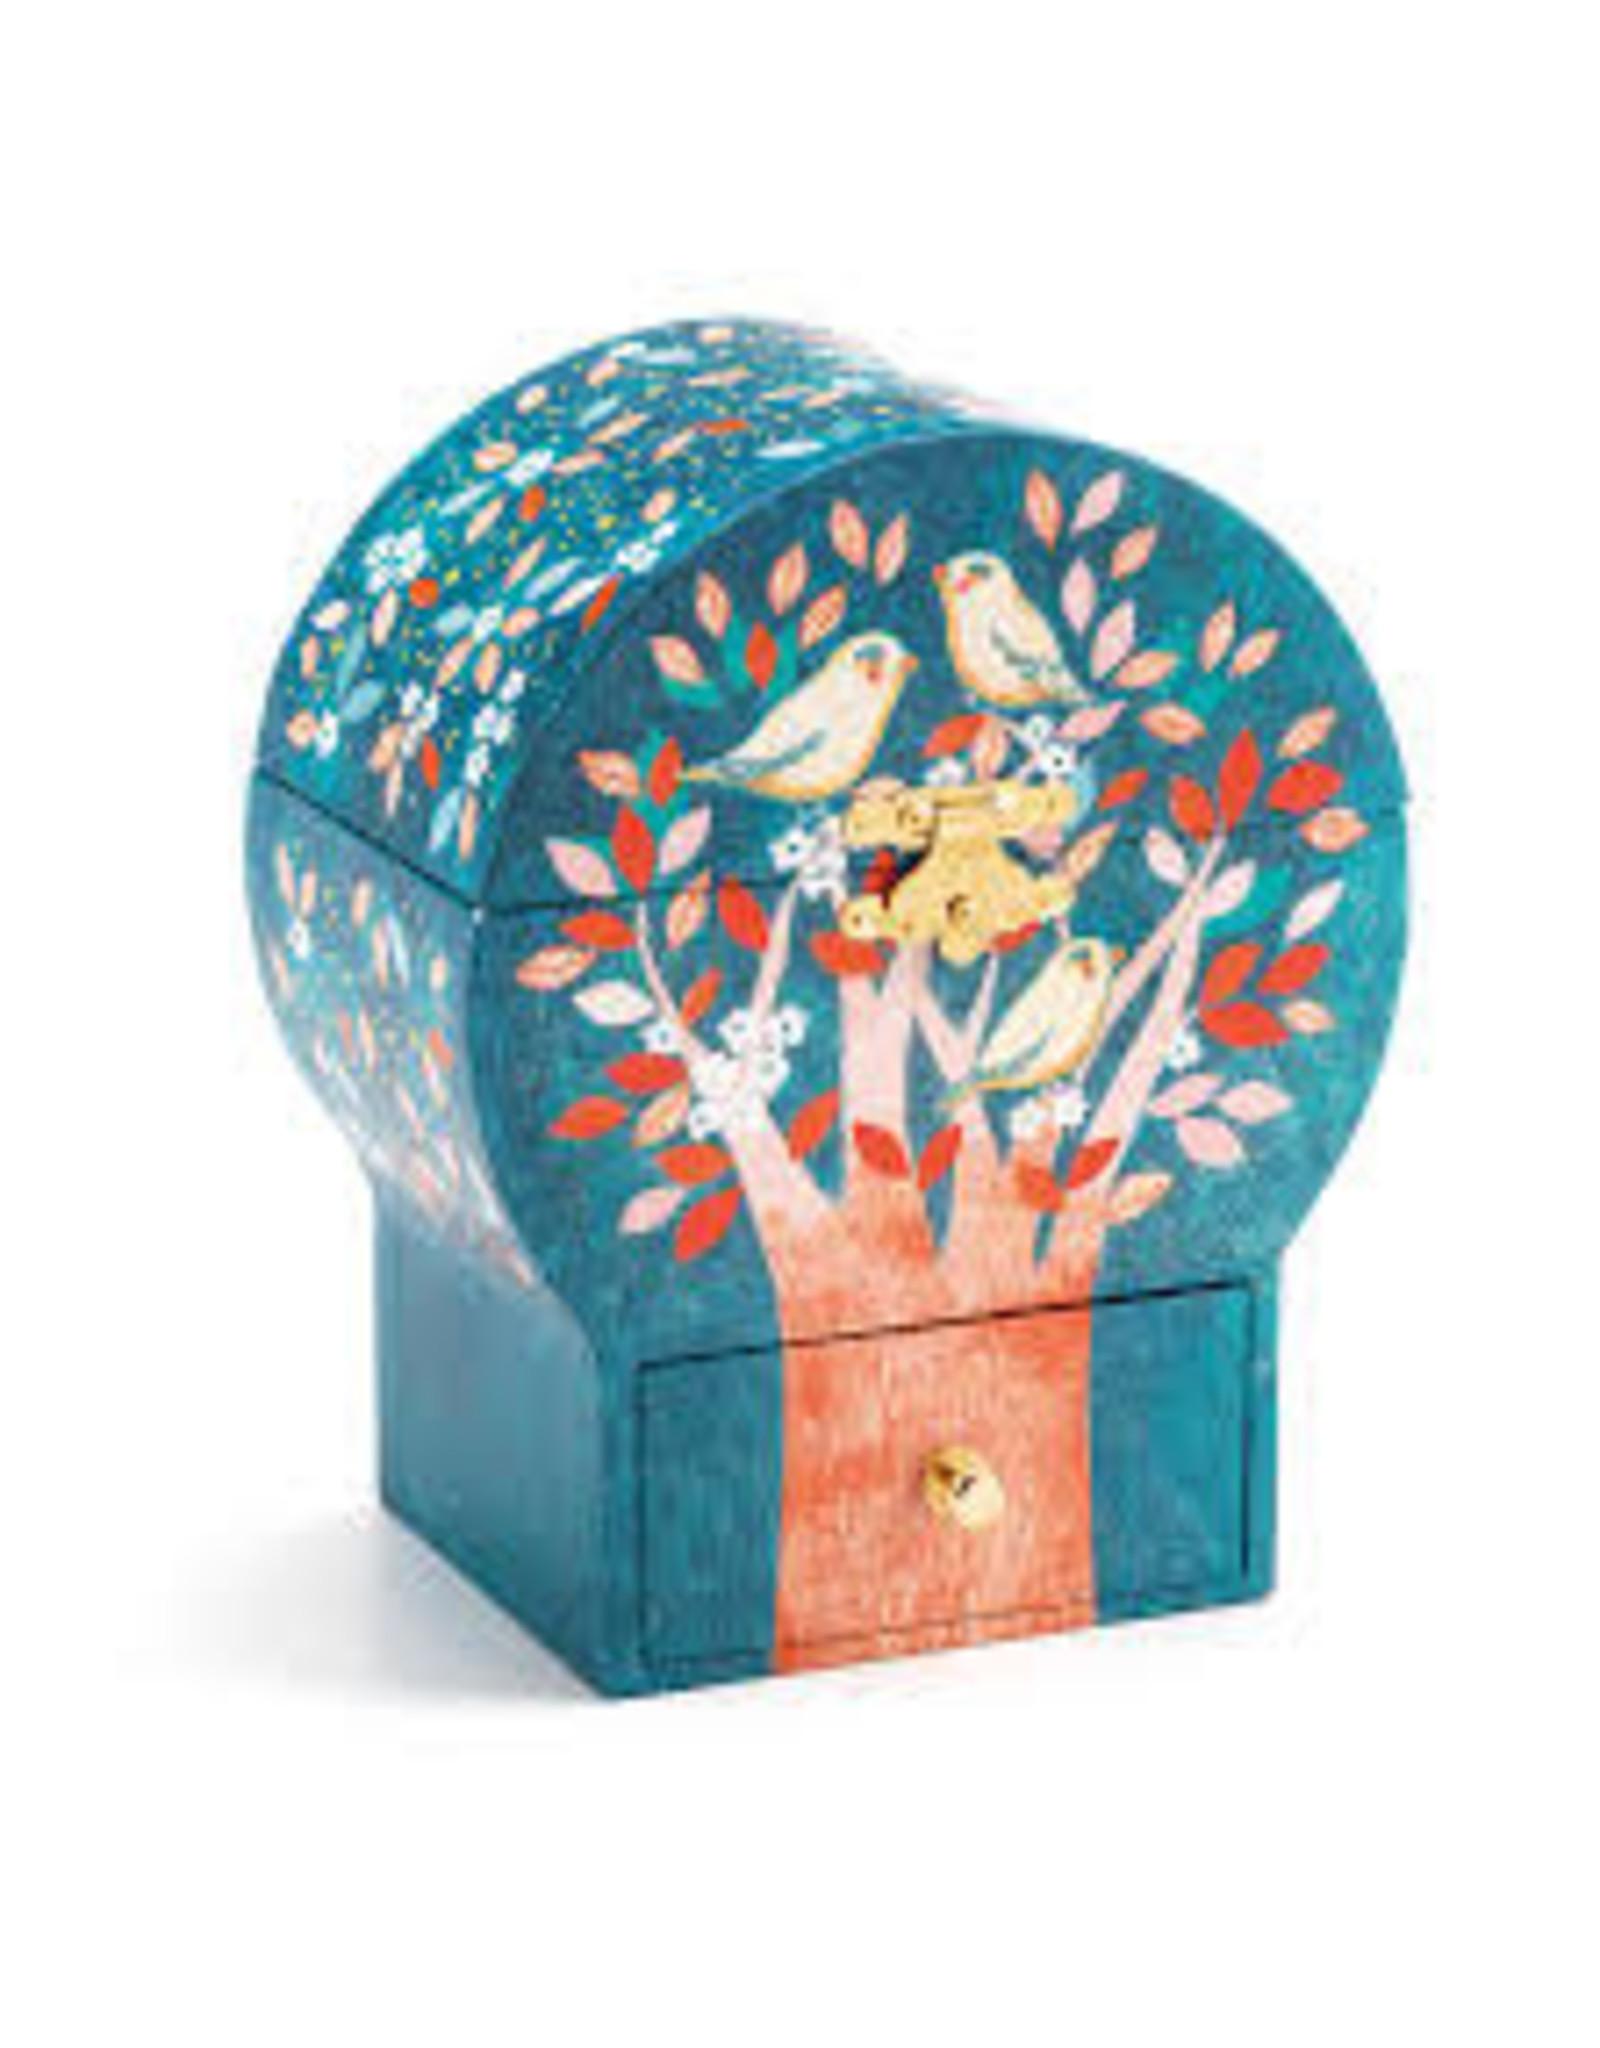 Djeco Night-Singing Musical Jewellery Box